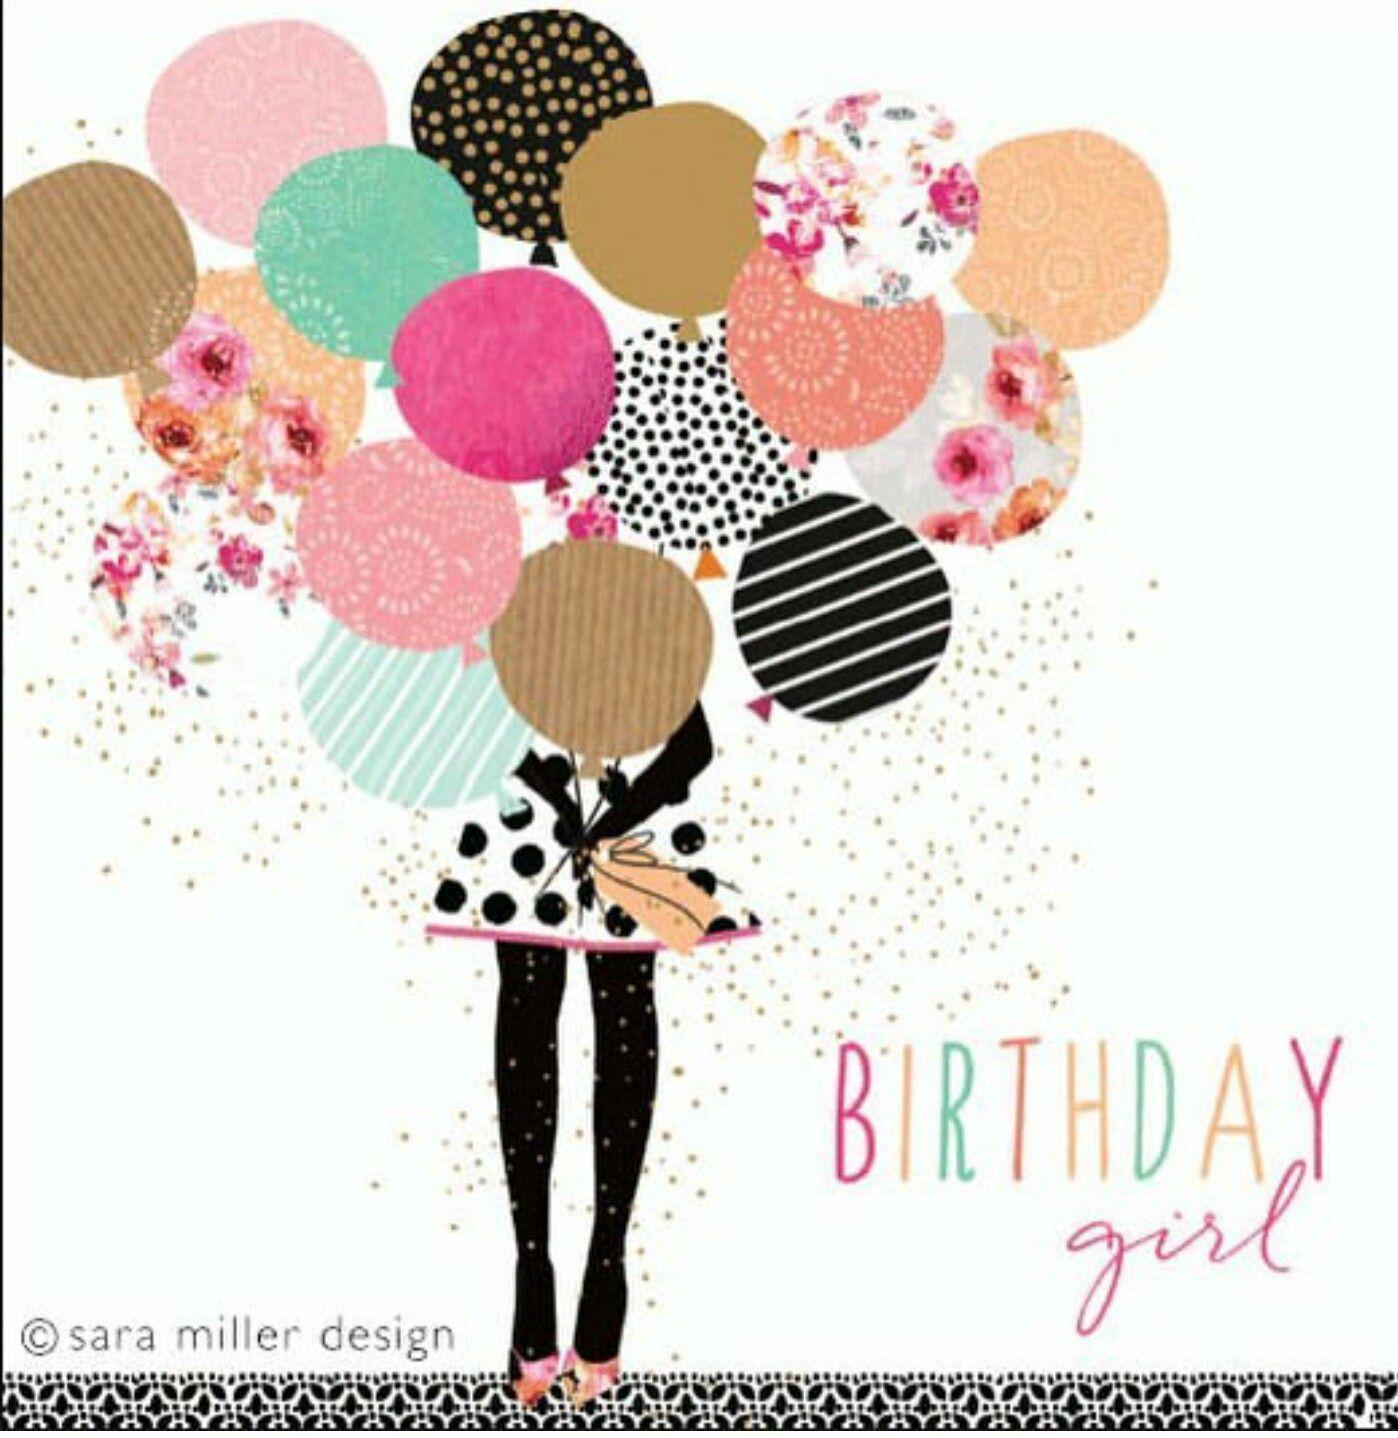 Pin by Koyo QUINONEZ on Happy Bday Birthday wishes girl